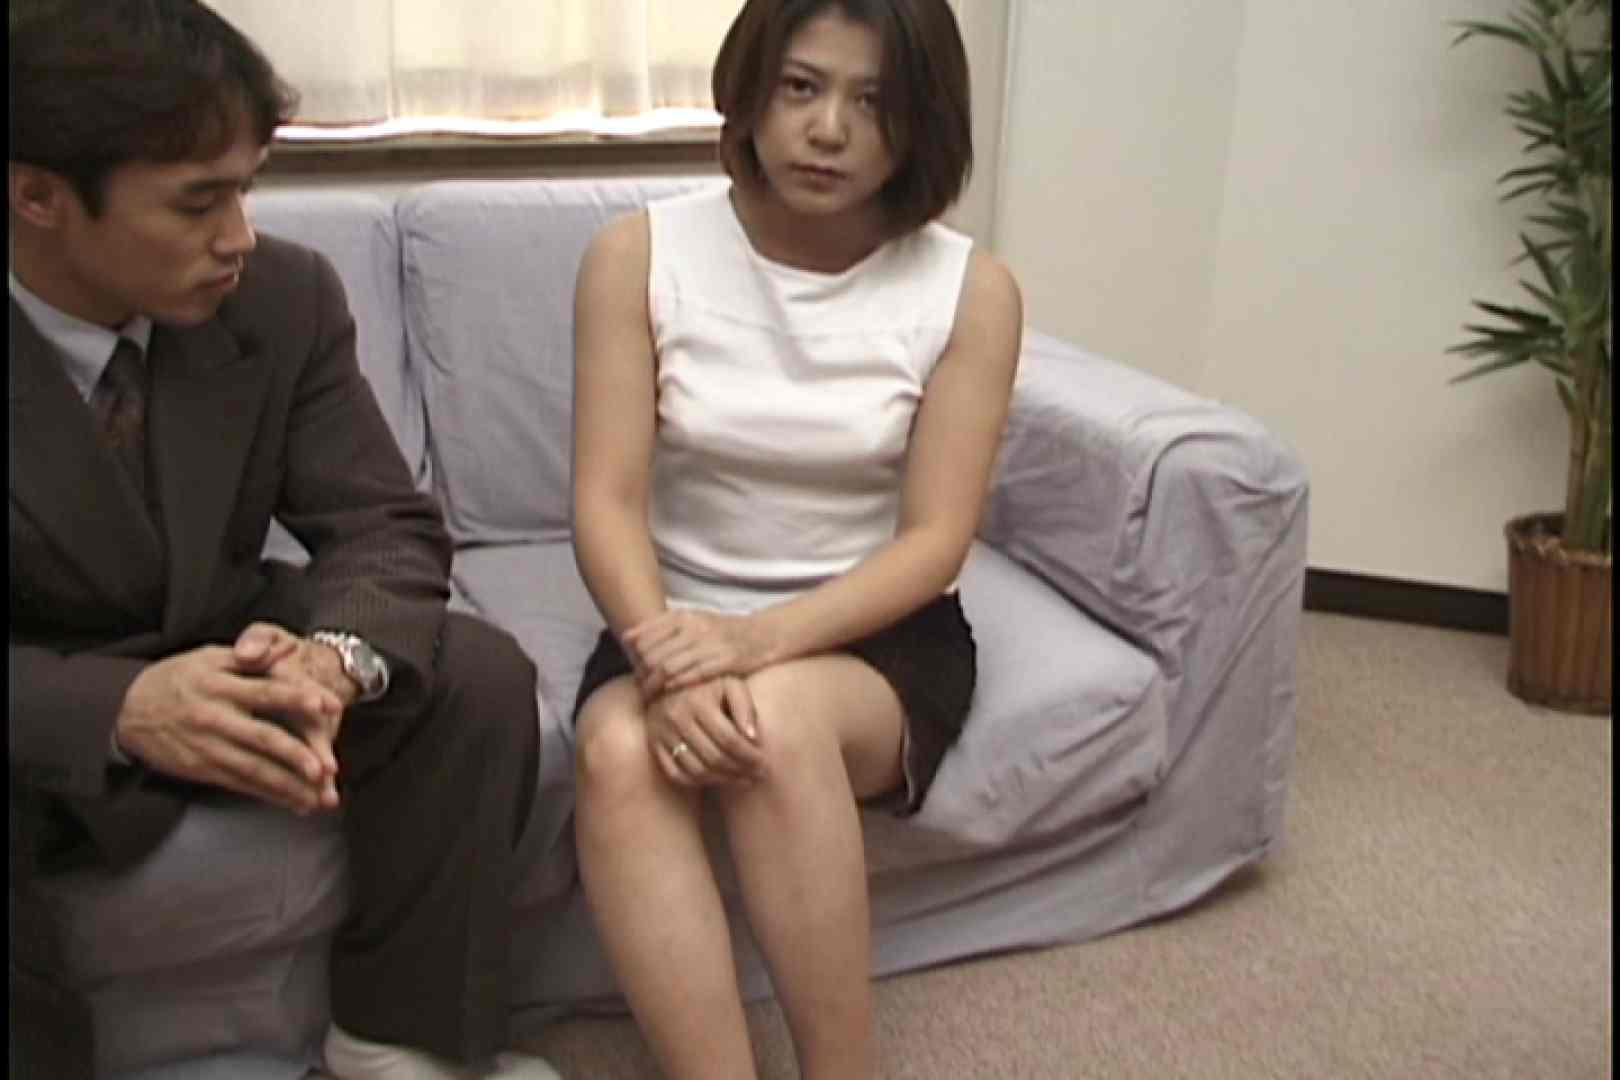 昼間の奥様は欲求不満 ~江口亜紀子~ 熟女  54連発 13